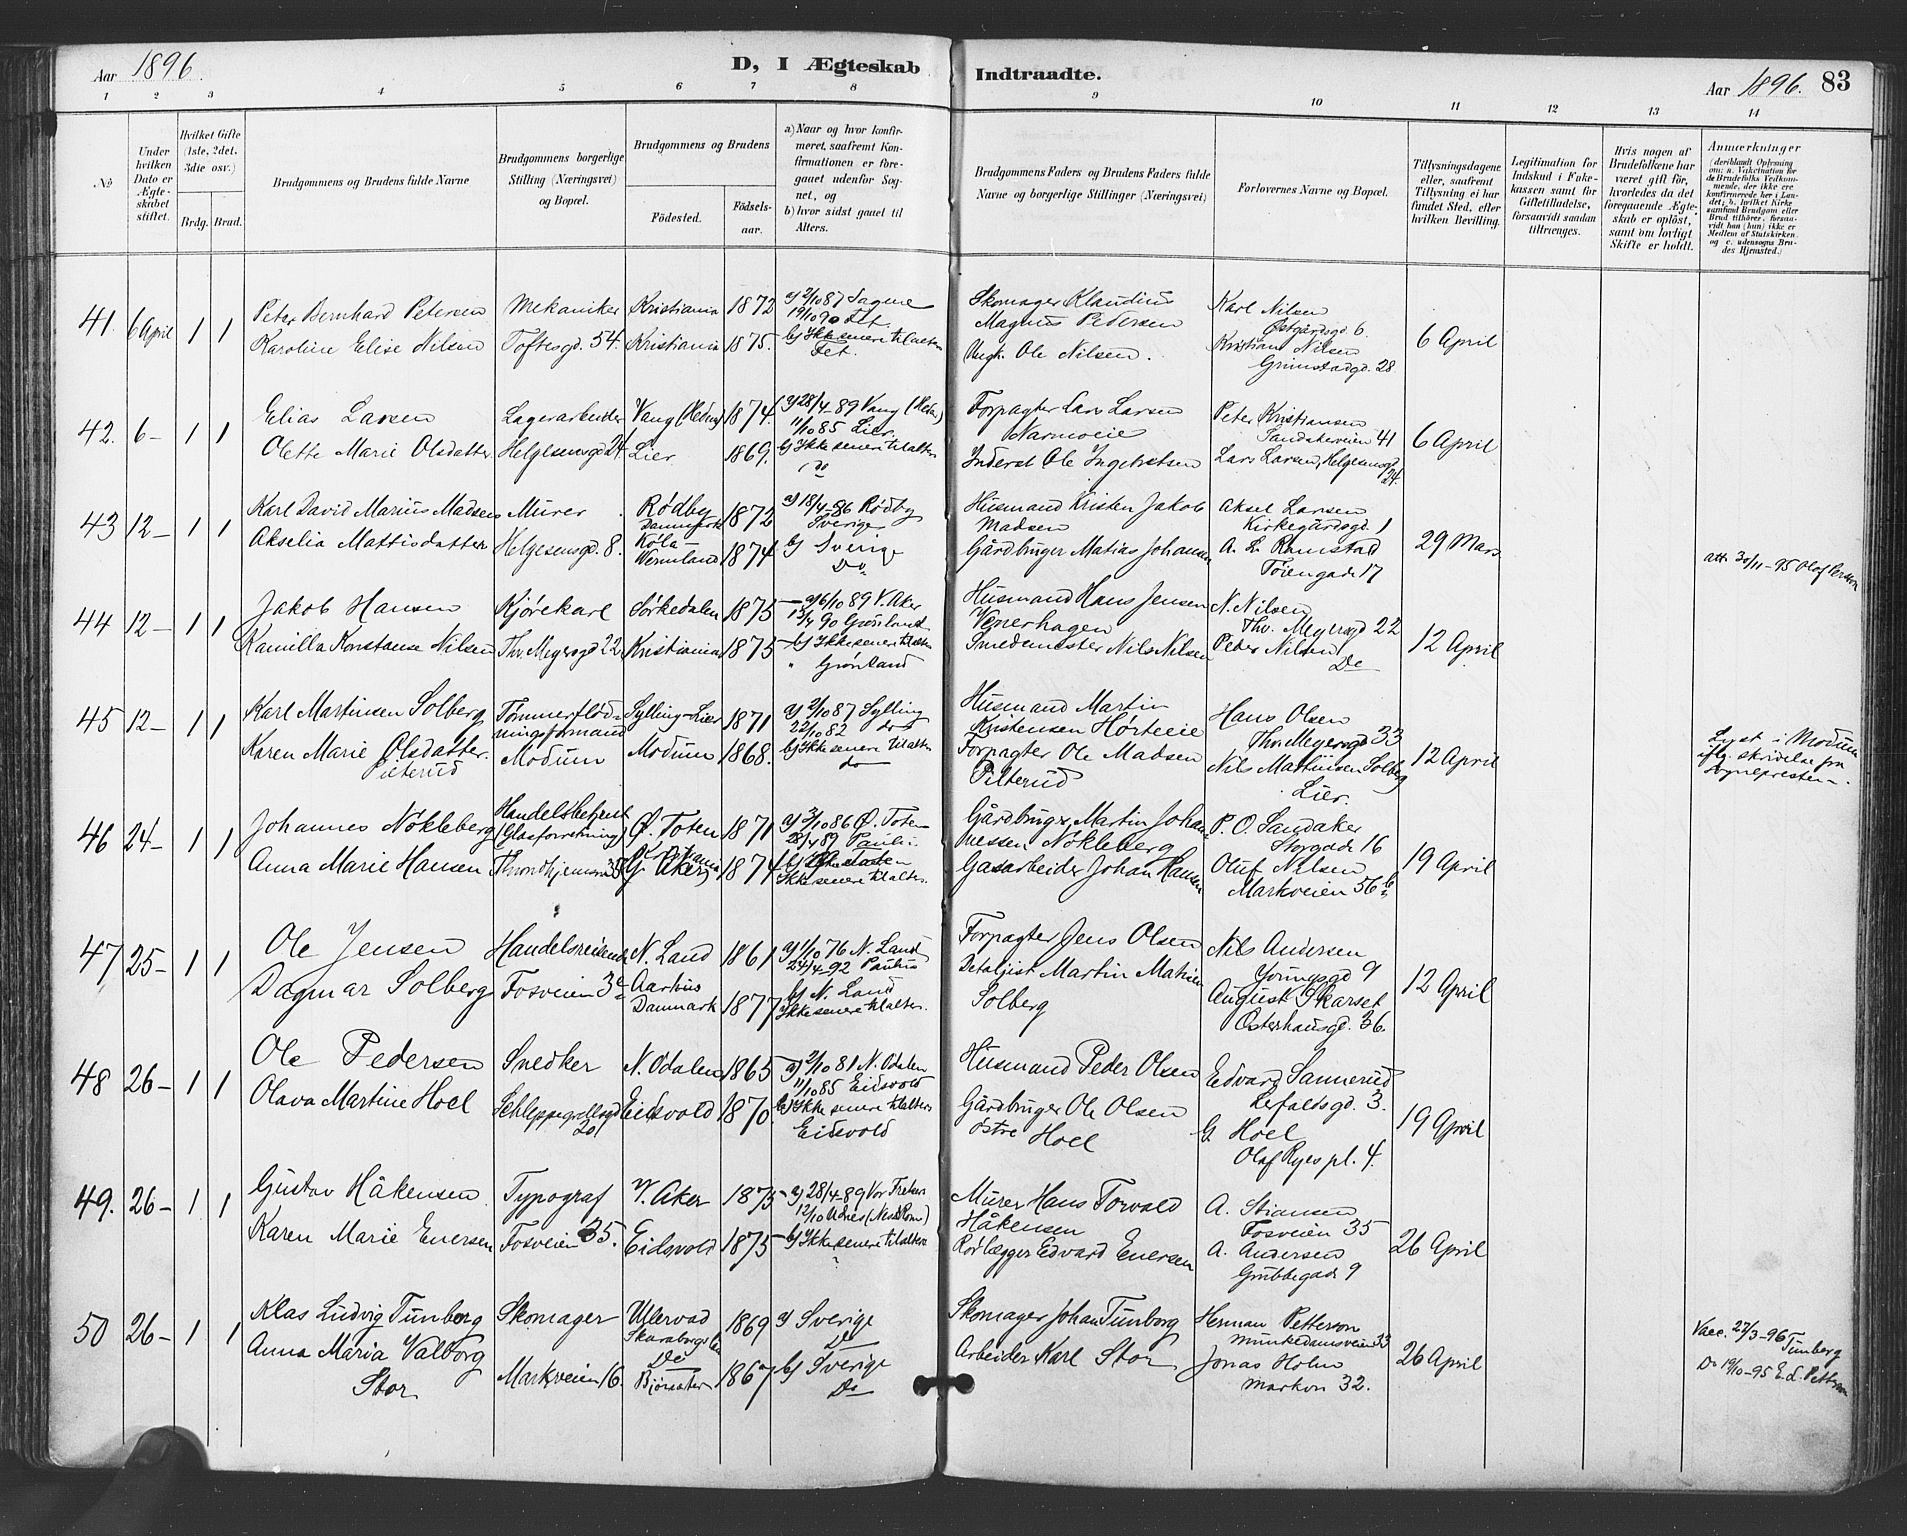 SAO, Paulus prestekontor Kirkebøker, F/Fa/L0009: Ministerialbok nr. 9, 1891-1901, s. 83